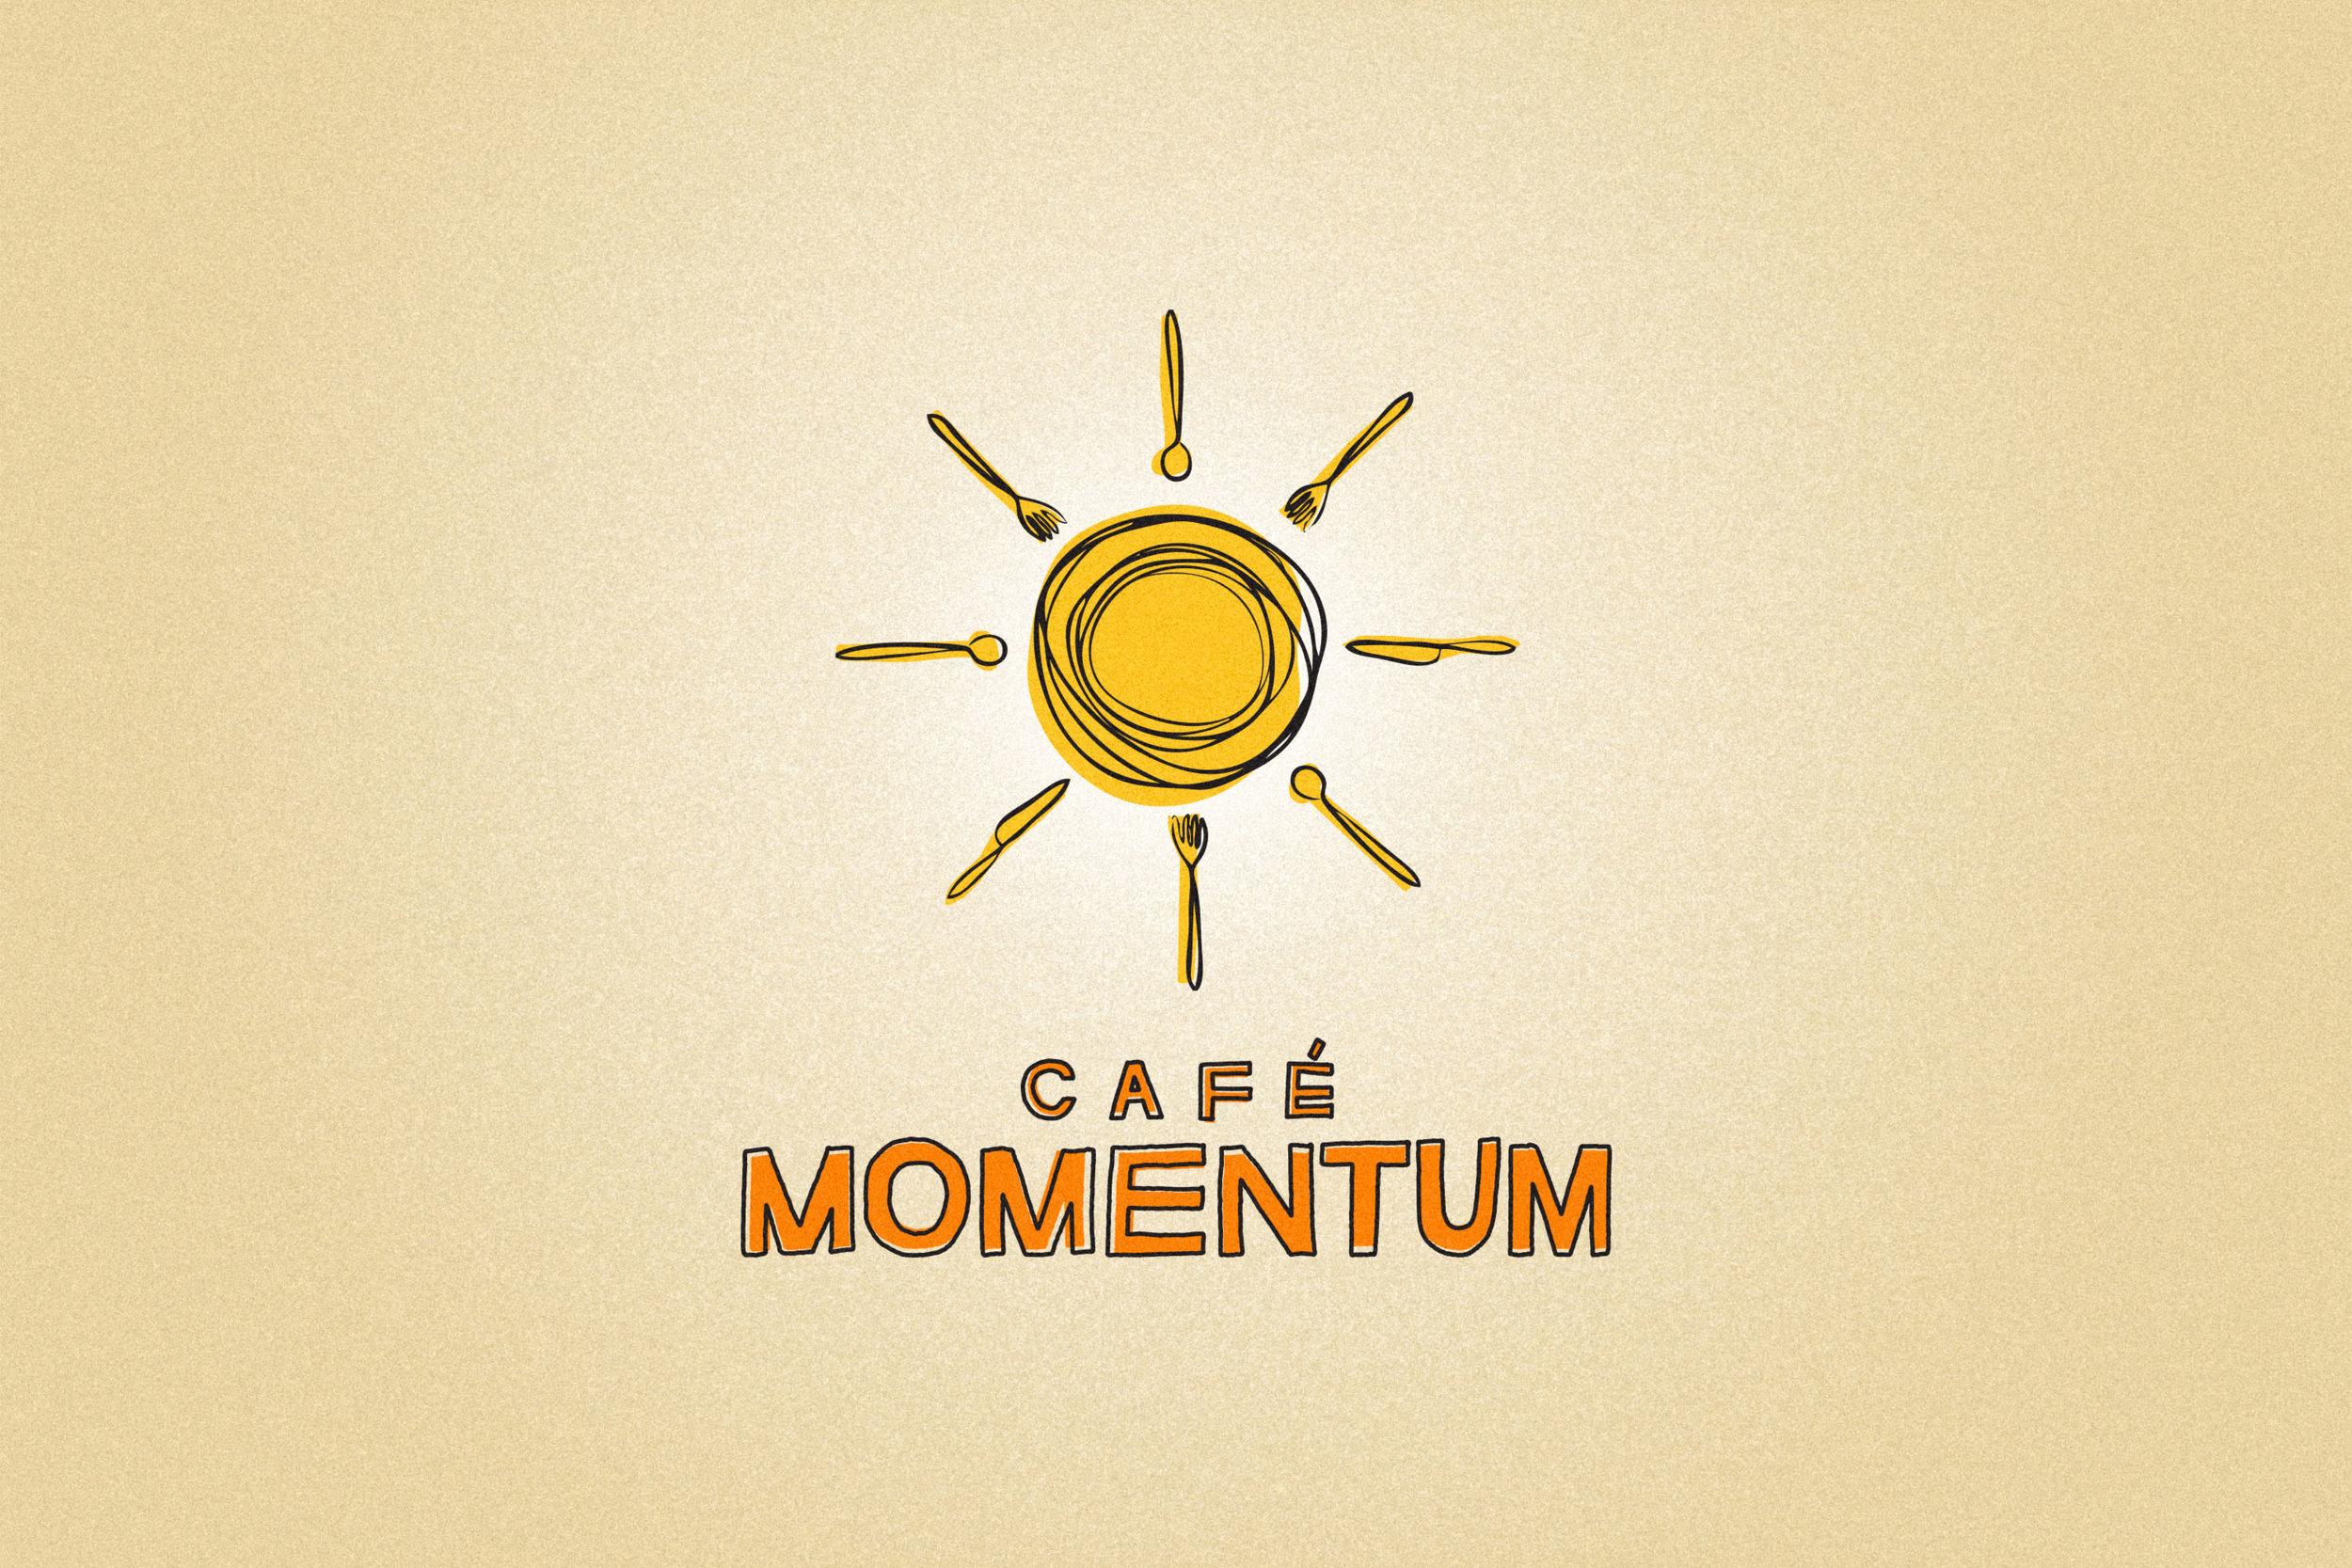 ronaldvillegas-cafe-momentum-logo.jpg